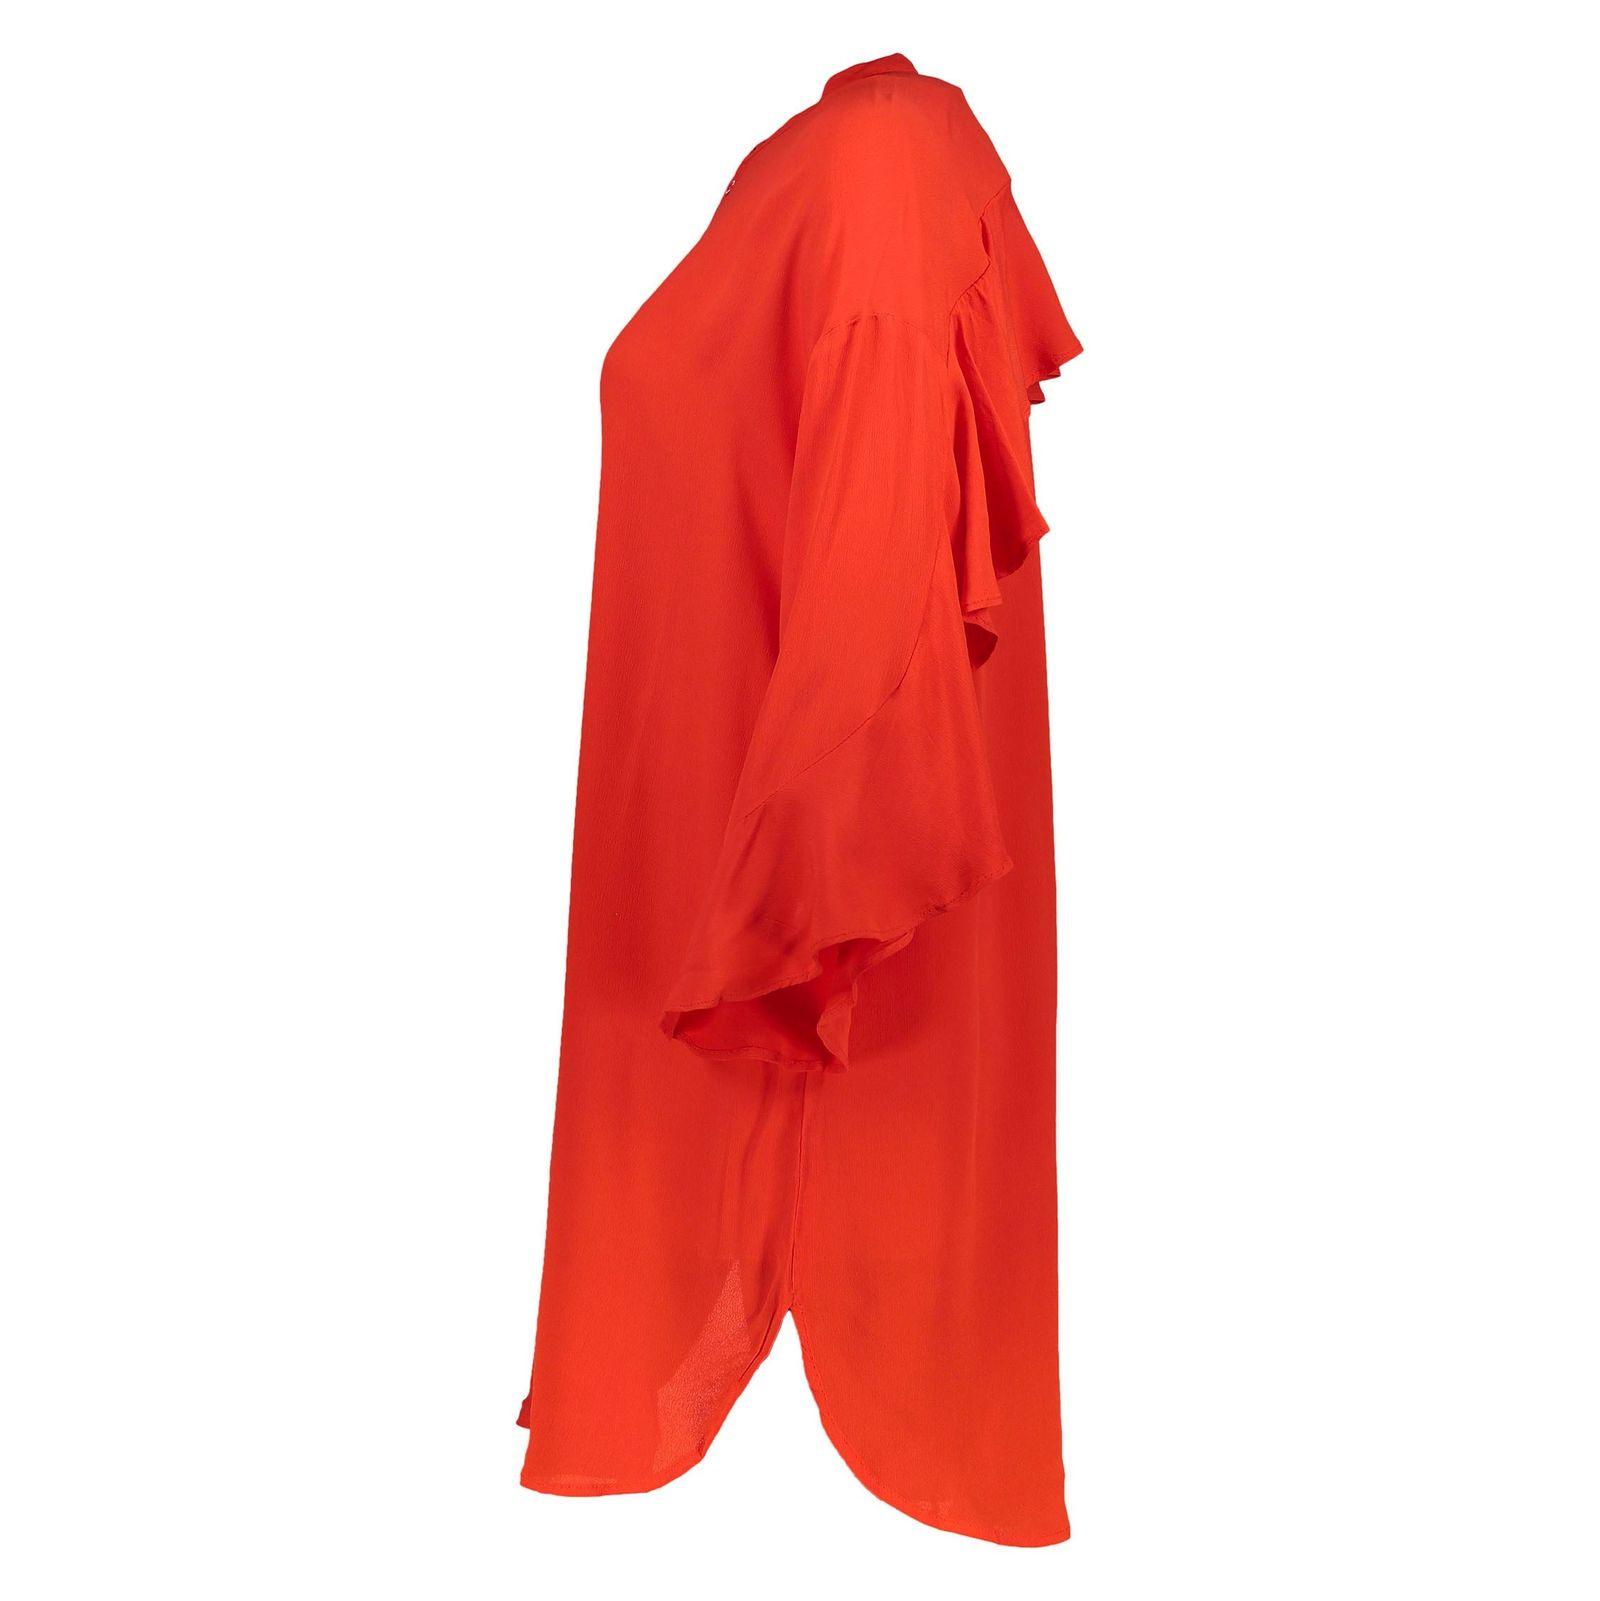 تونیک ویسکوز بلند زنانه - ورو مدا - قرمز - 4